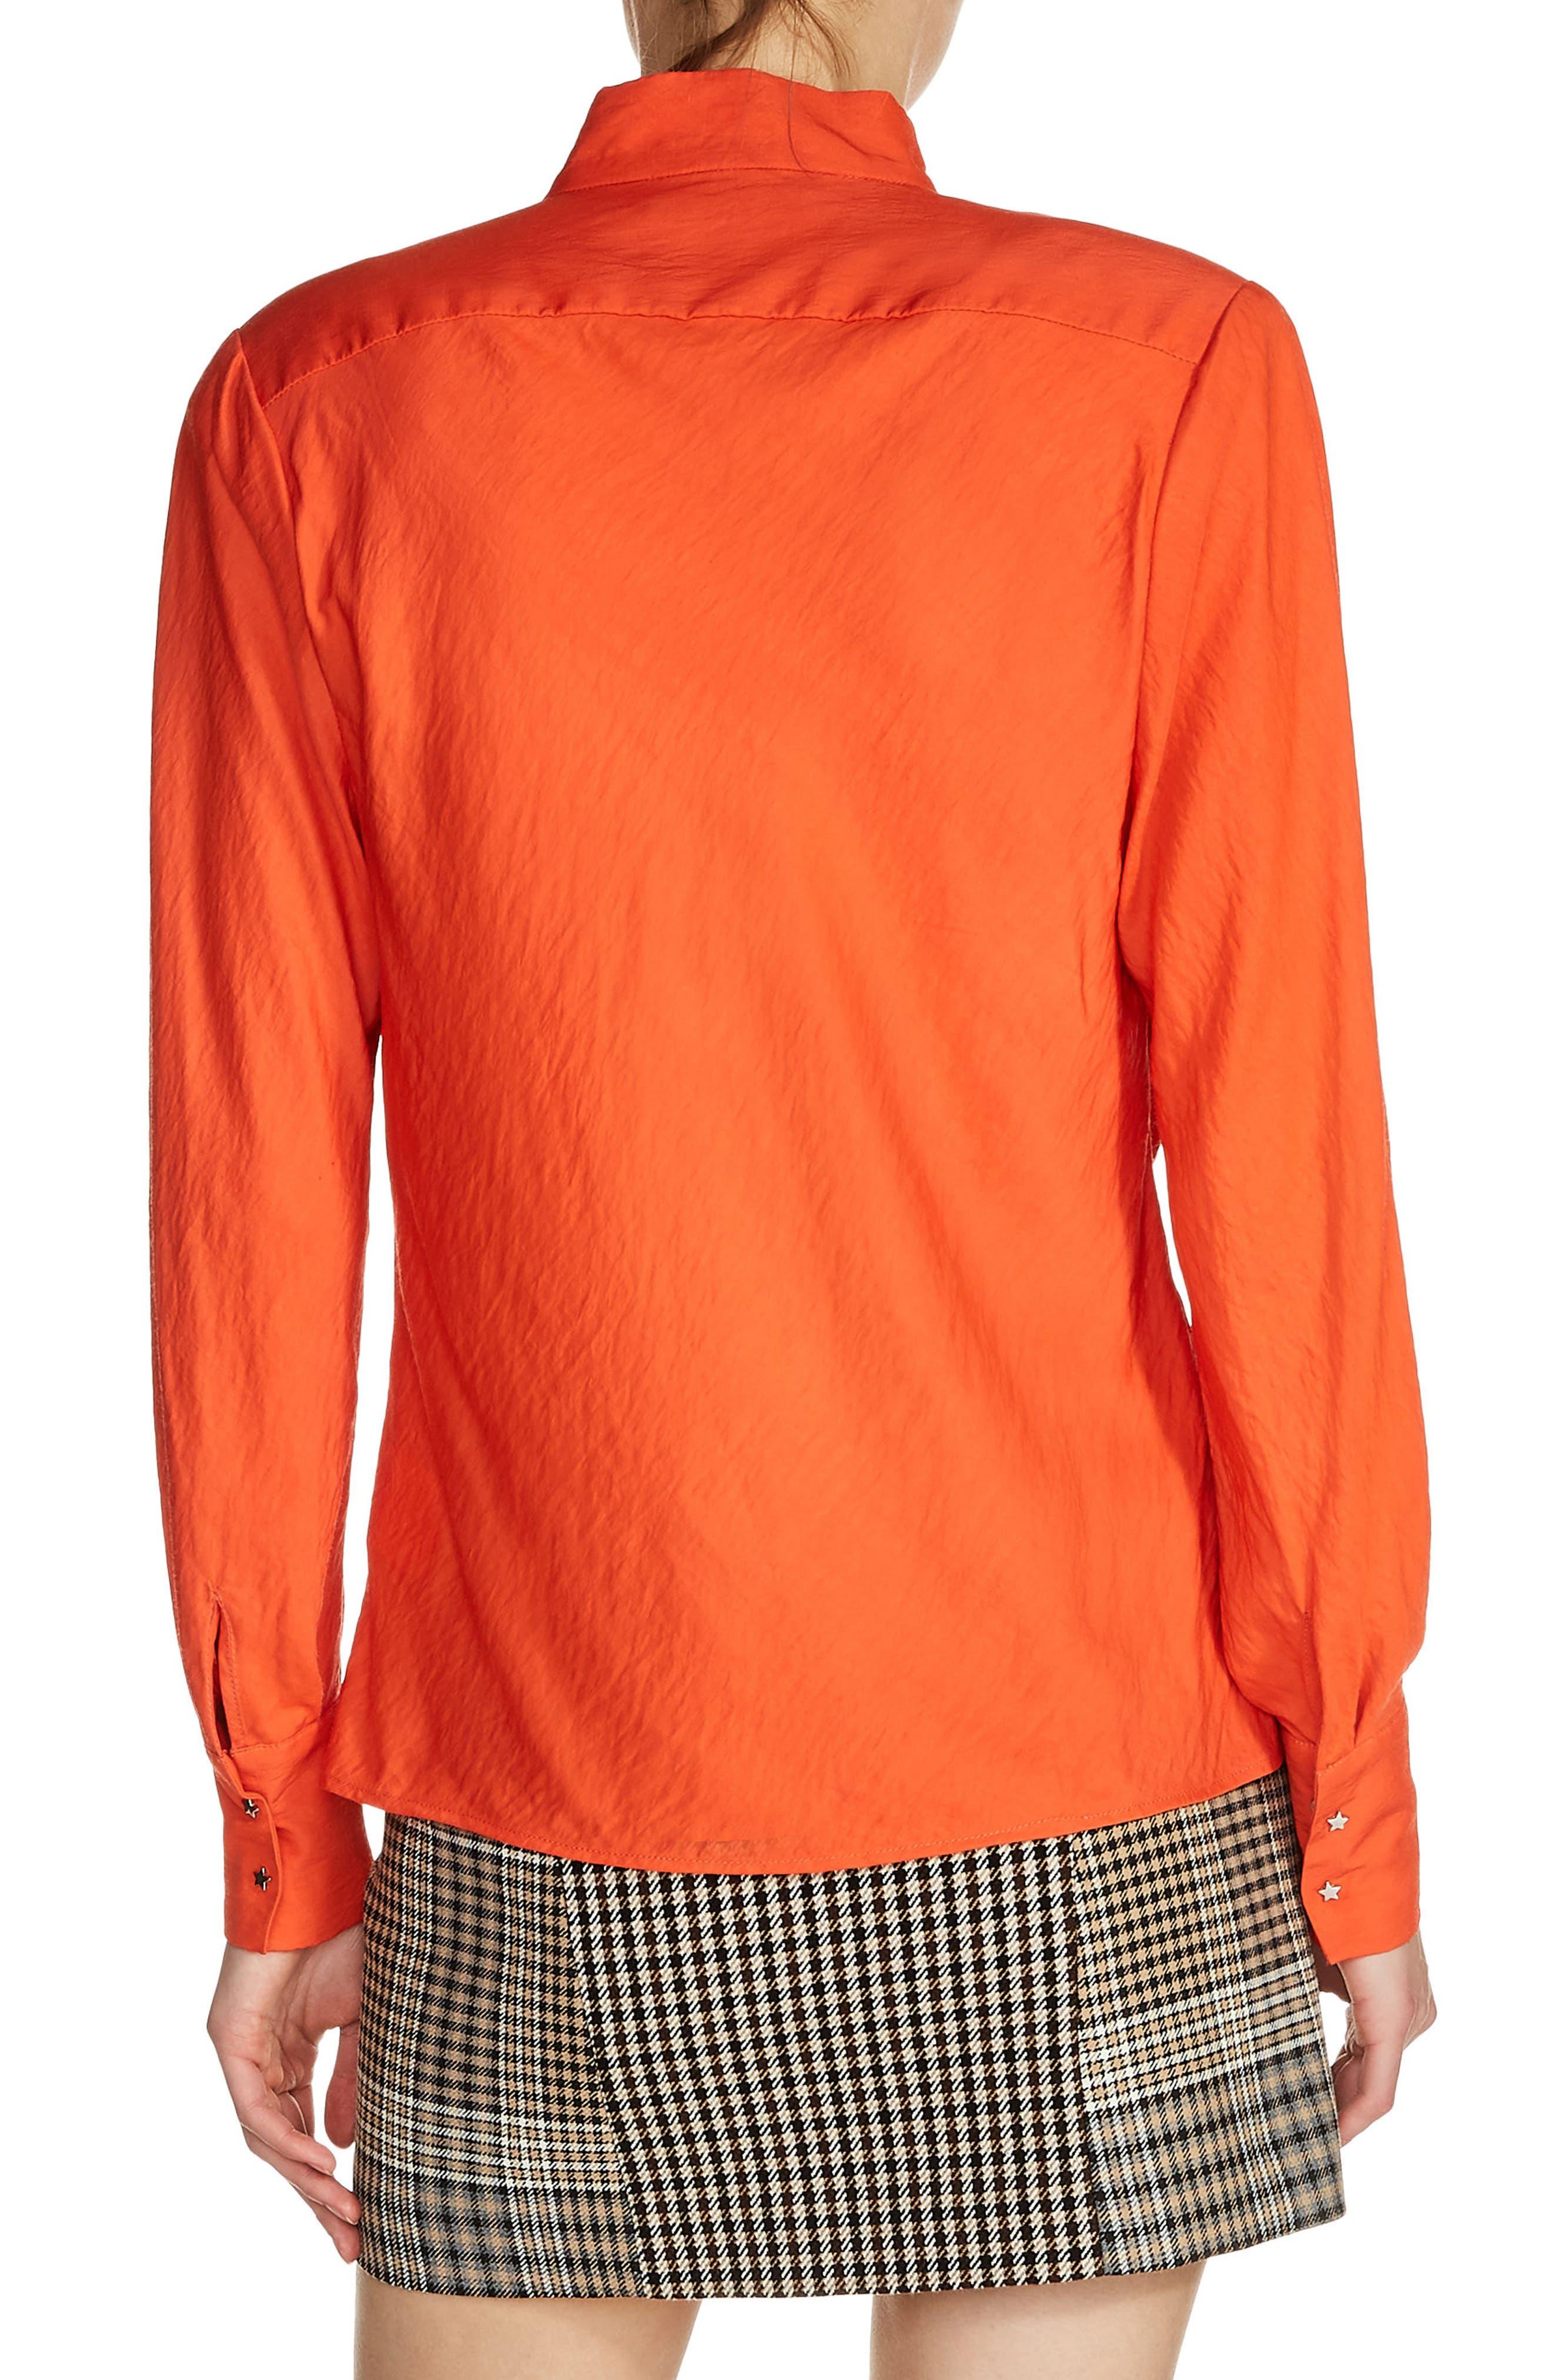 Star Snap Stand Collar Blouse,                             Alternate thumbnail 2, color,                             Orange